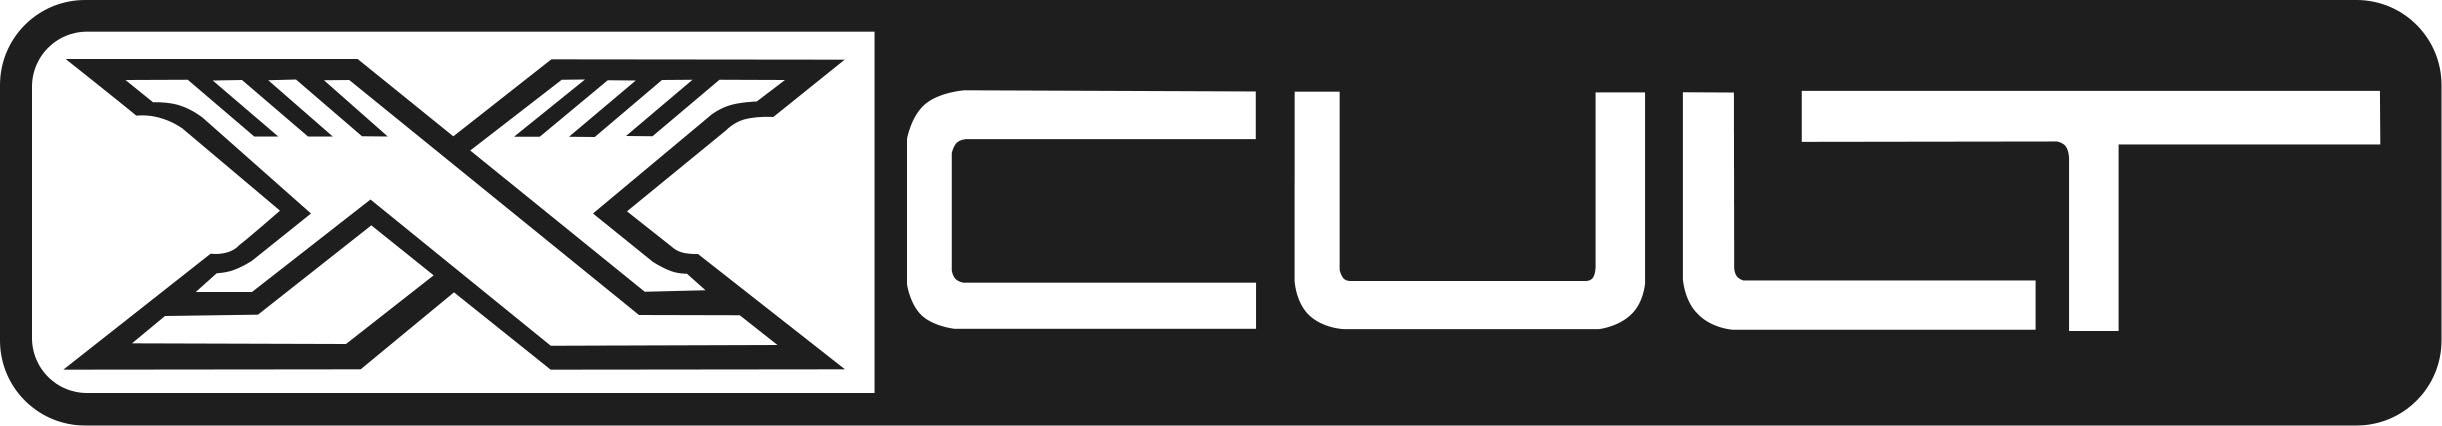 X-Cult